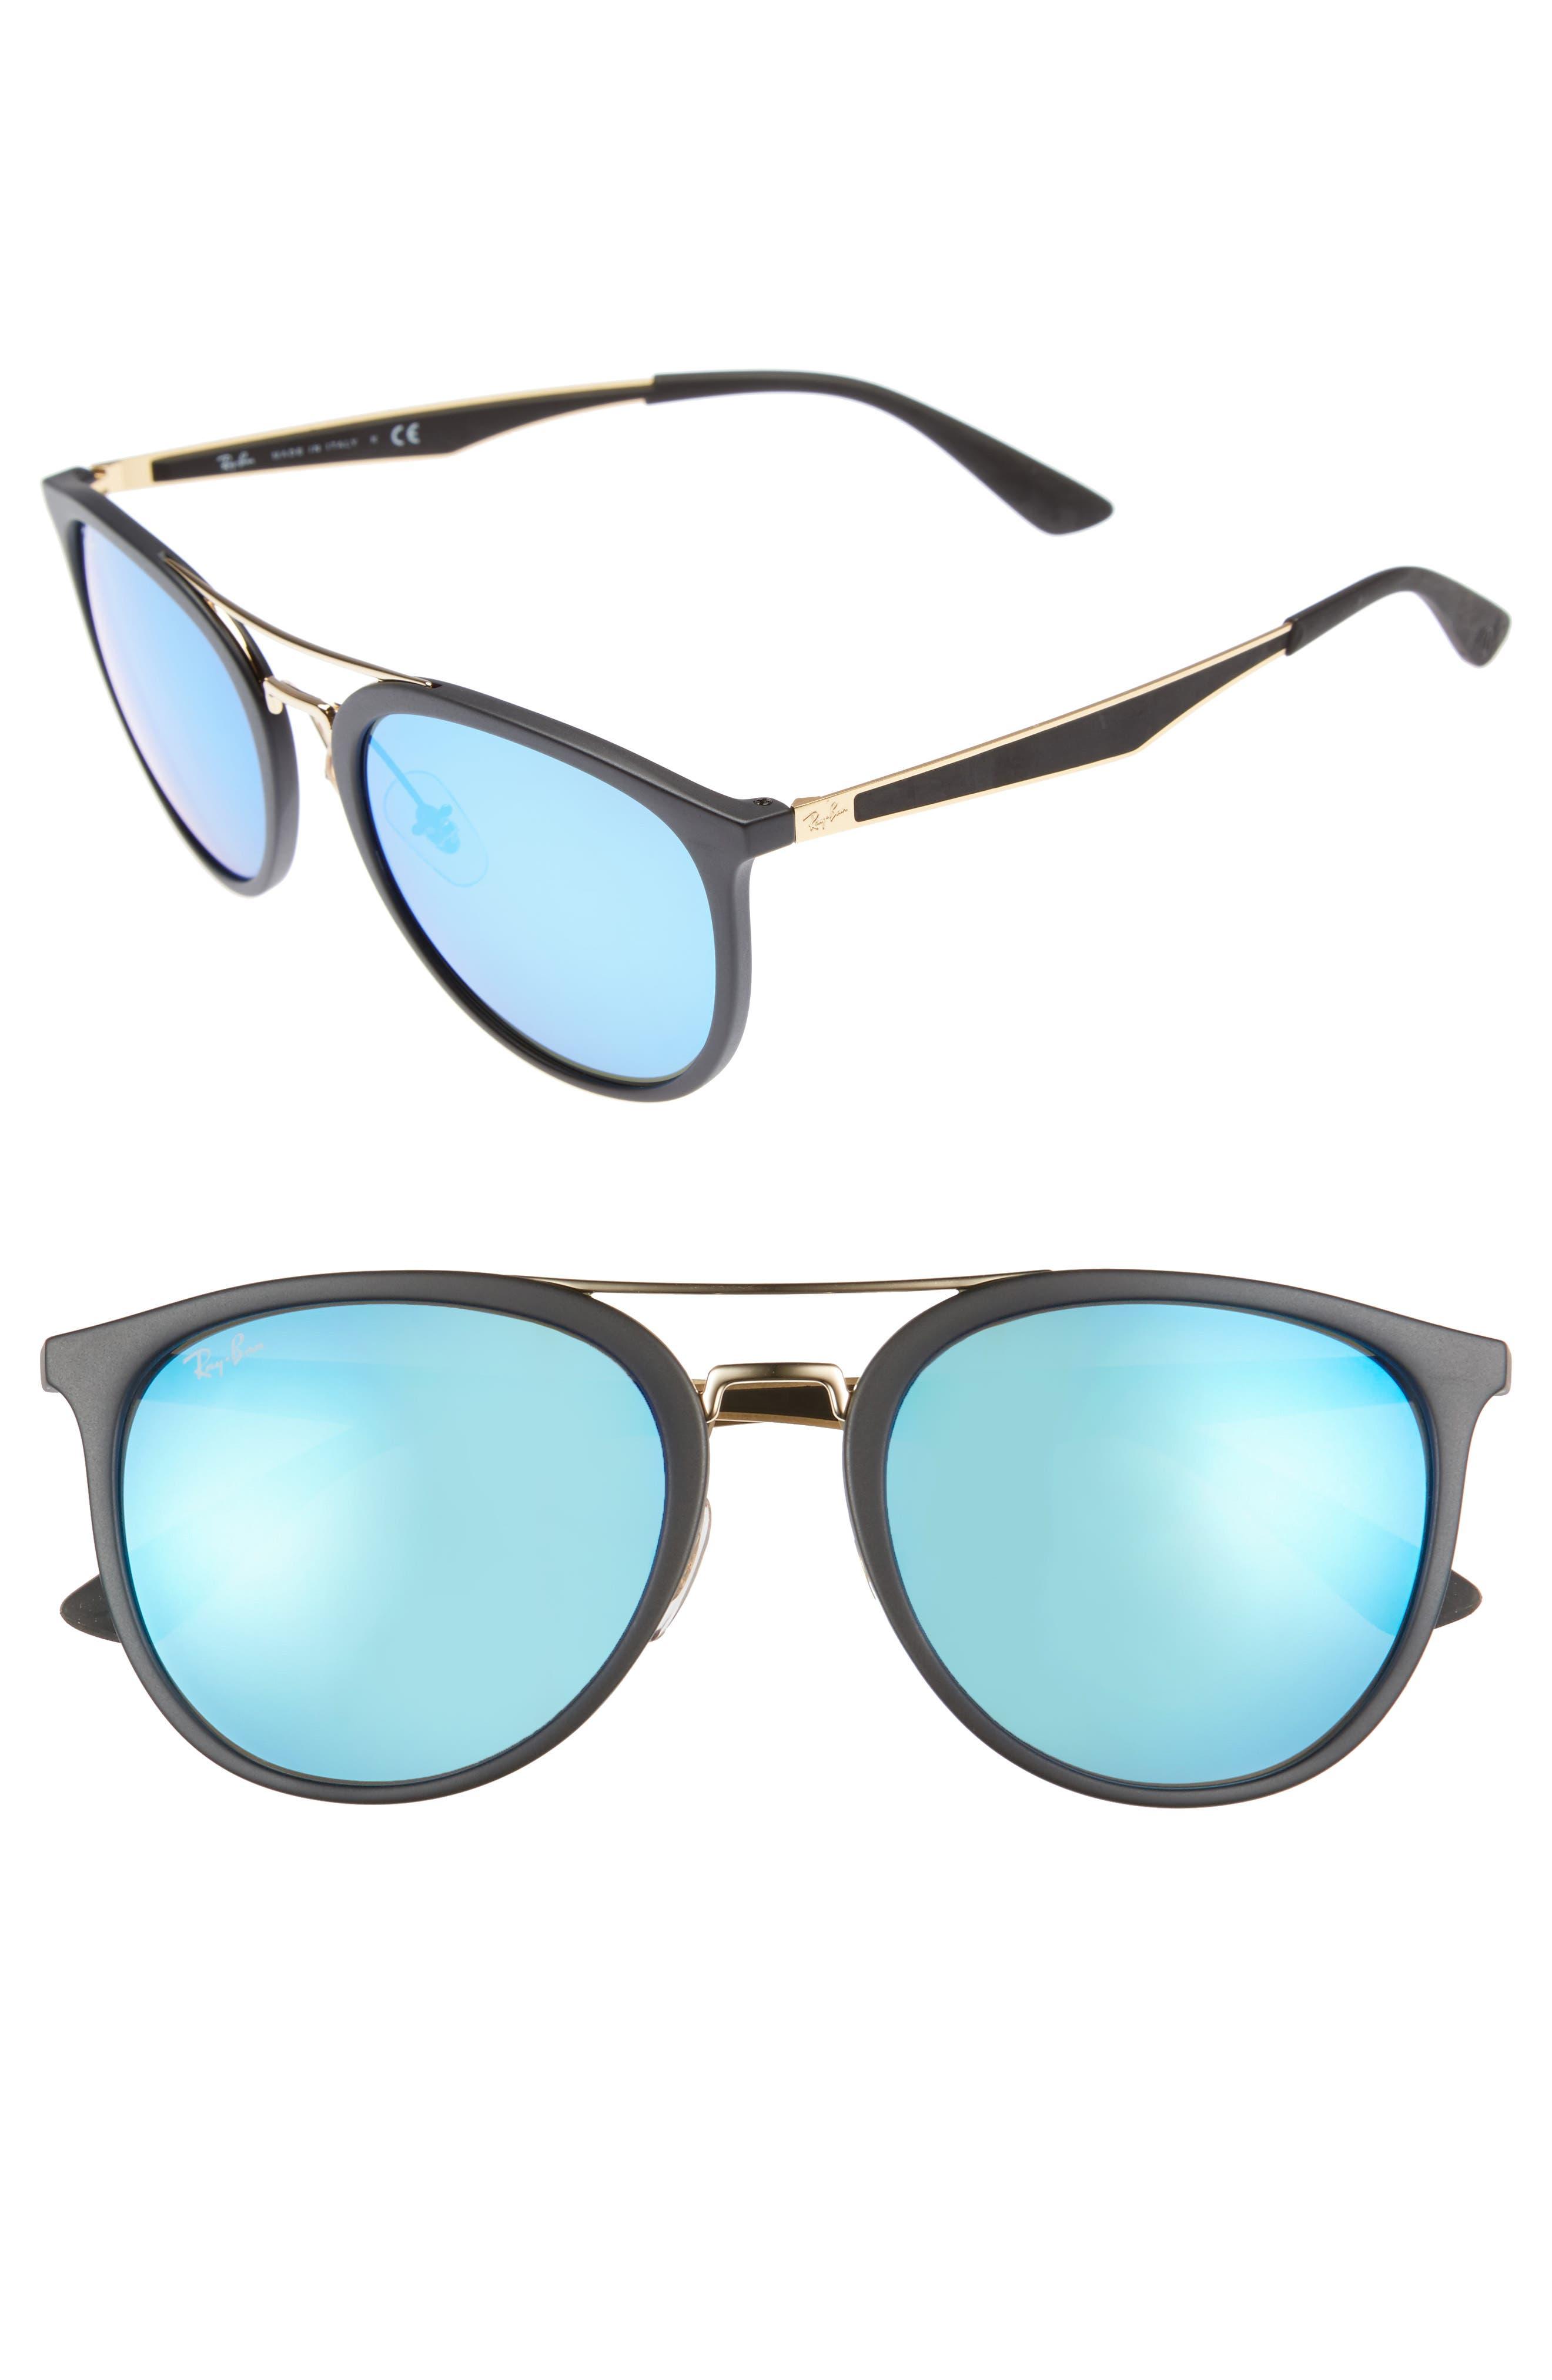 Main Image - Ray-Ban 55mm Retro Sunglasses